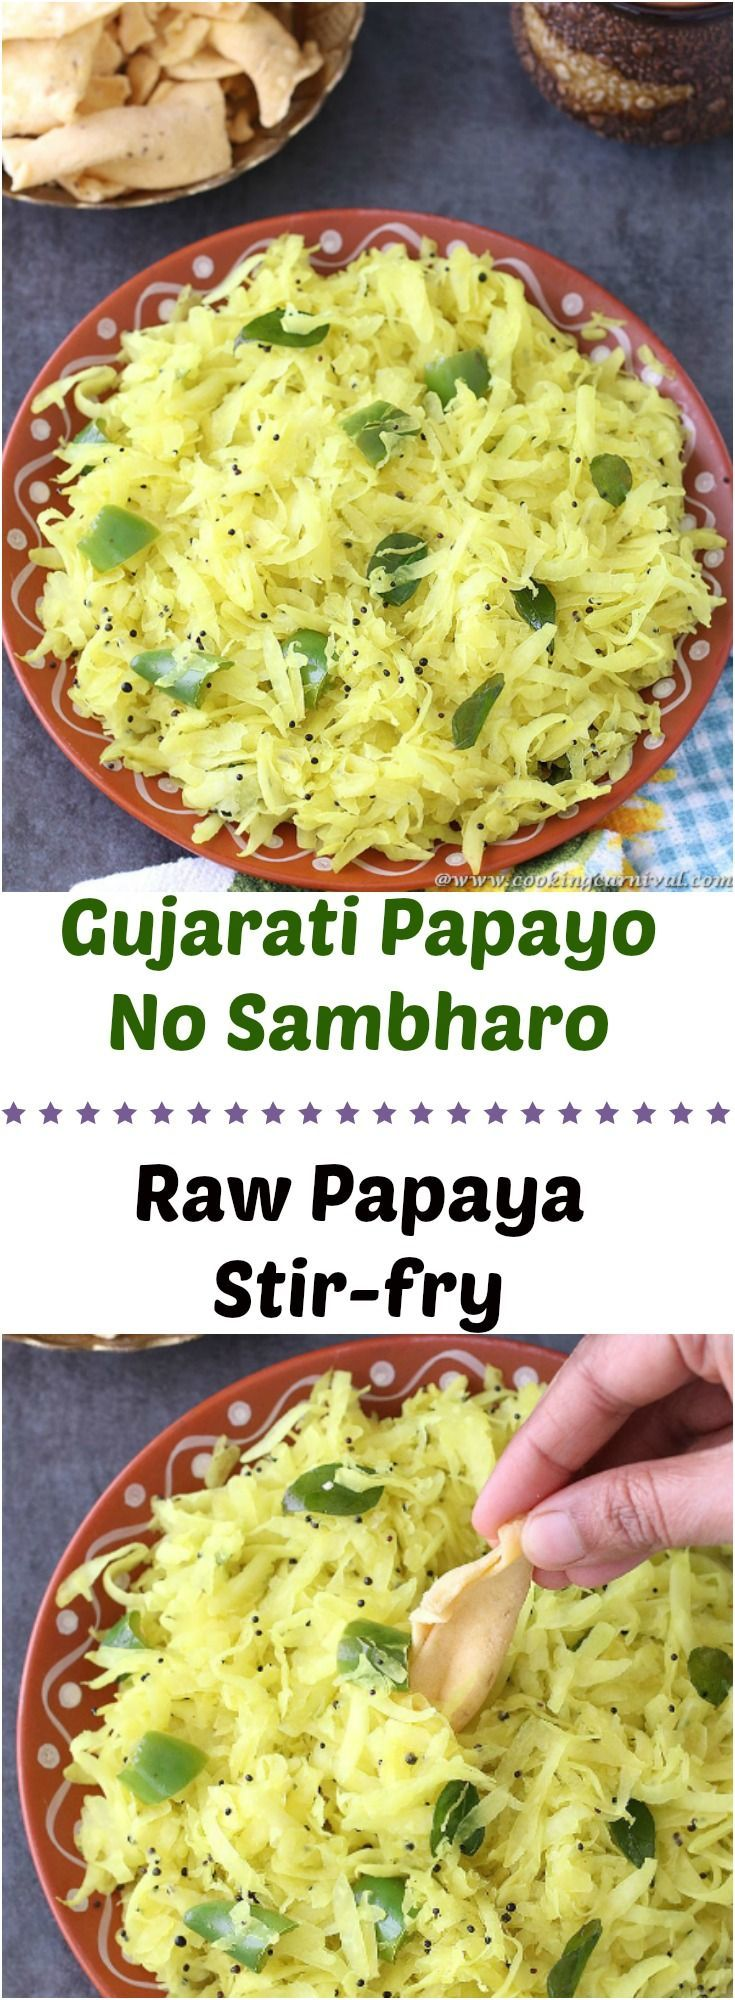 Papaya No Sambharo / Kacha Papaya No Sambharo / Warm Raw Papaya Salad is a traditional Gujarati side dish made with Raw Papaya and couple of spices, and served along with Fafda Gathiya, Thepla or with Gujarati Main Course. #gujaraticuisine #sambharo #Rawpapaya #Gujjurecipe #warmsalad #salad #sidedish #10minuterecipe #gathiyajalebi #fafdagathiya #condiments